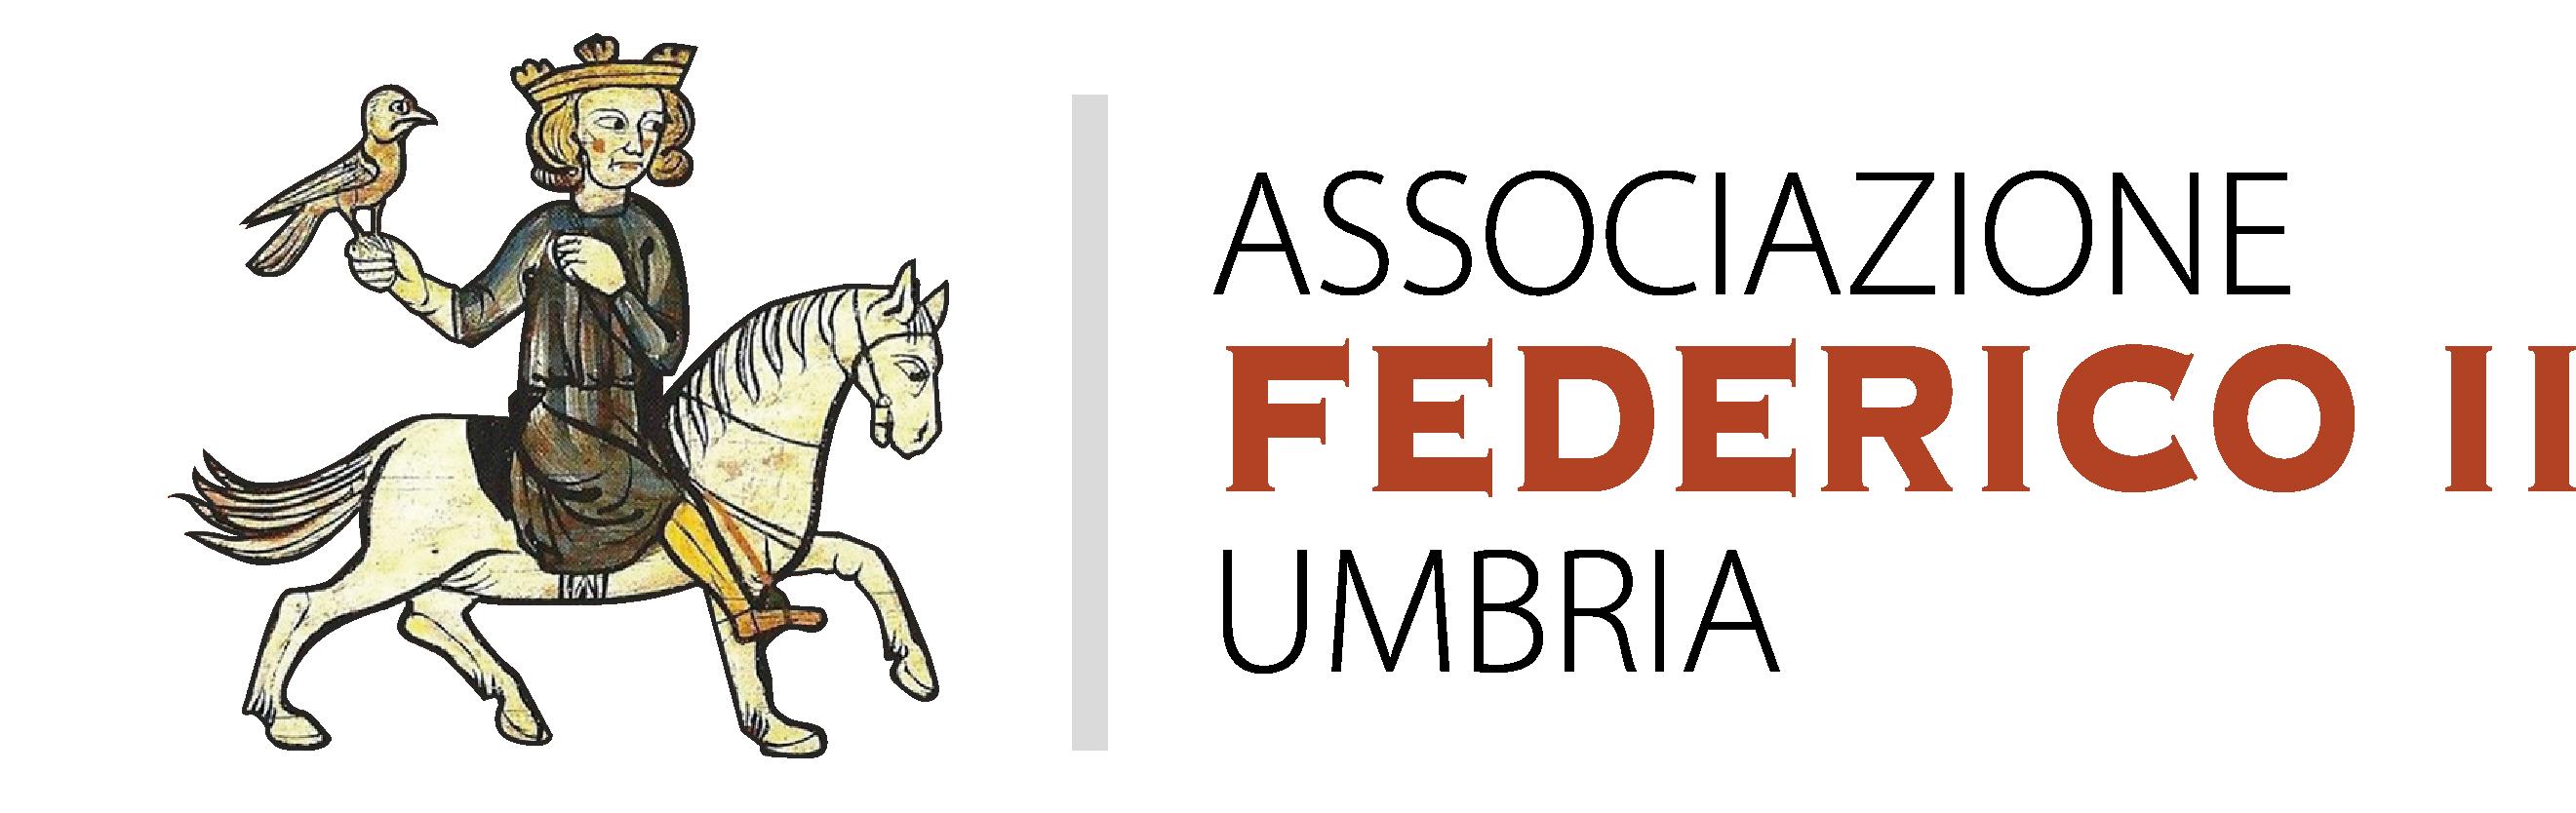 Federico II di Svevia